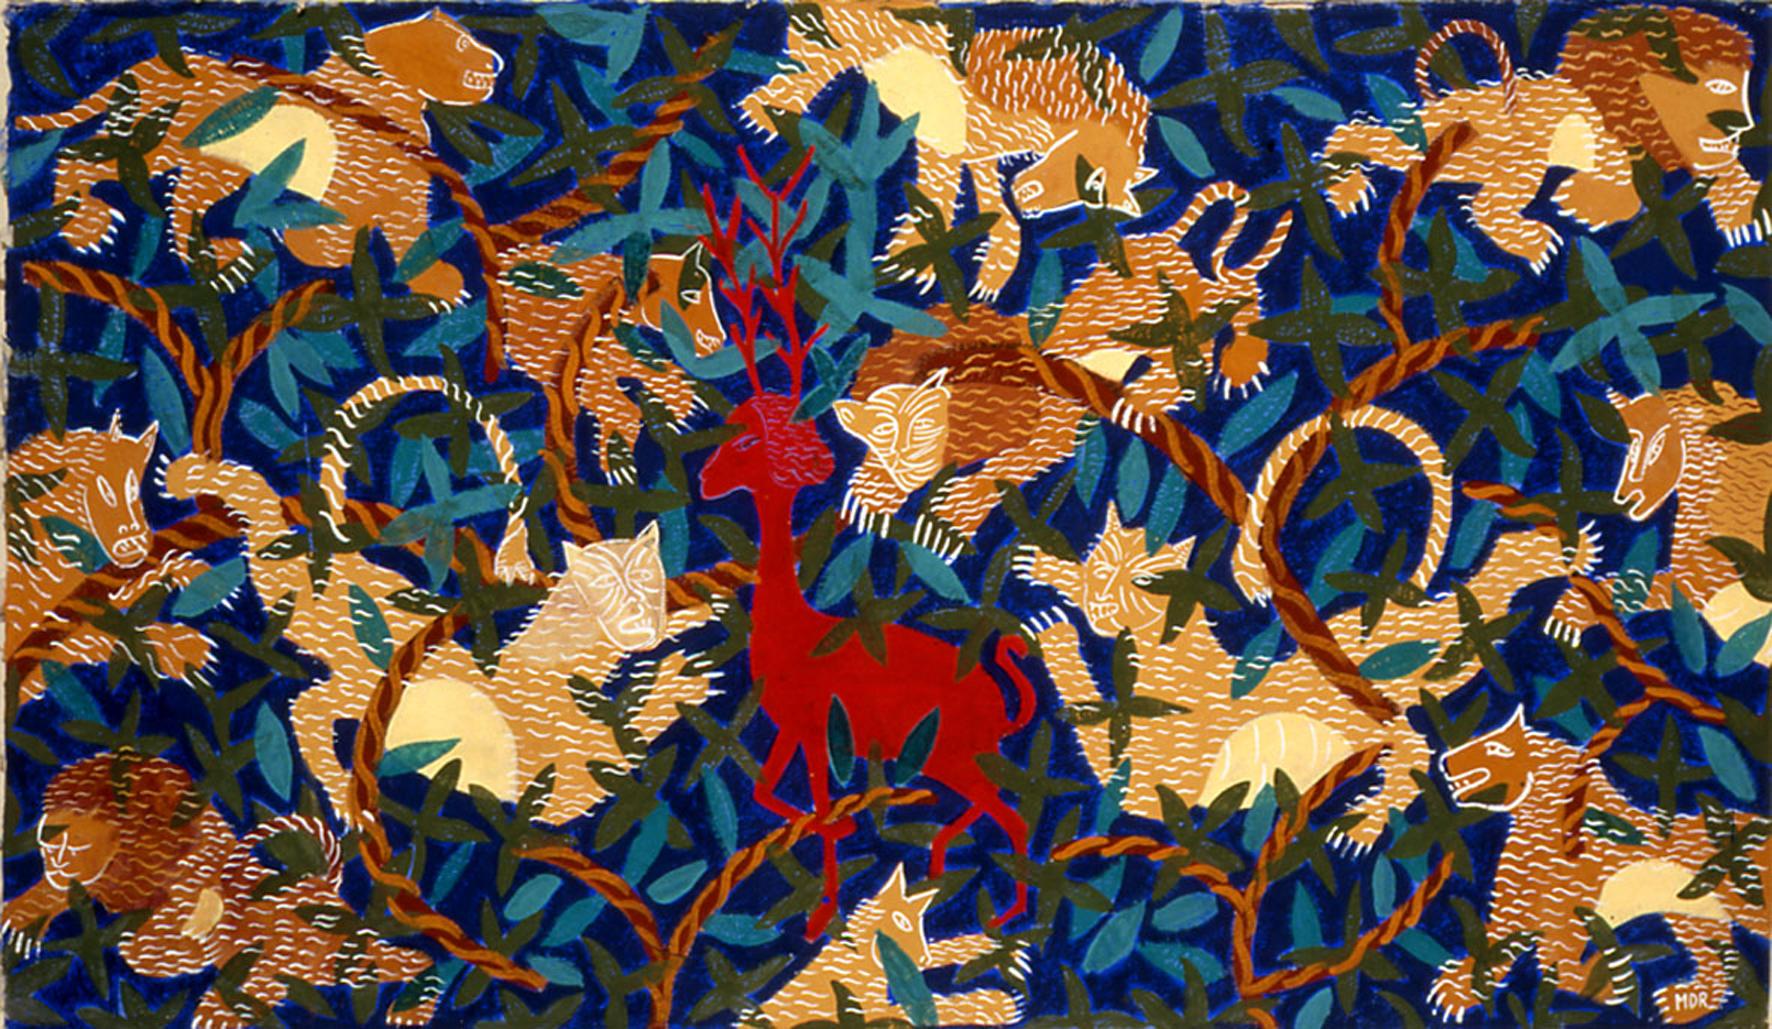 Mémoire de l'âge d'or II,  Tempera on Nepalese Paper, 2002, 58 x 9 9 in.